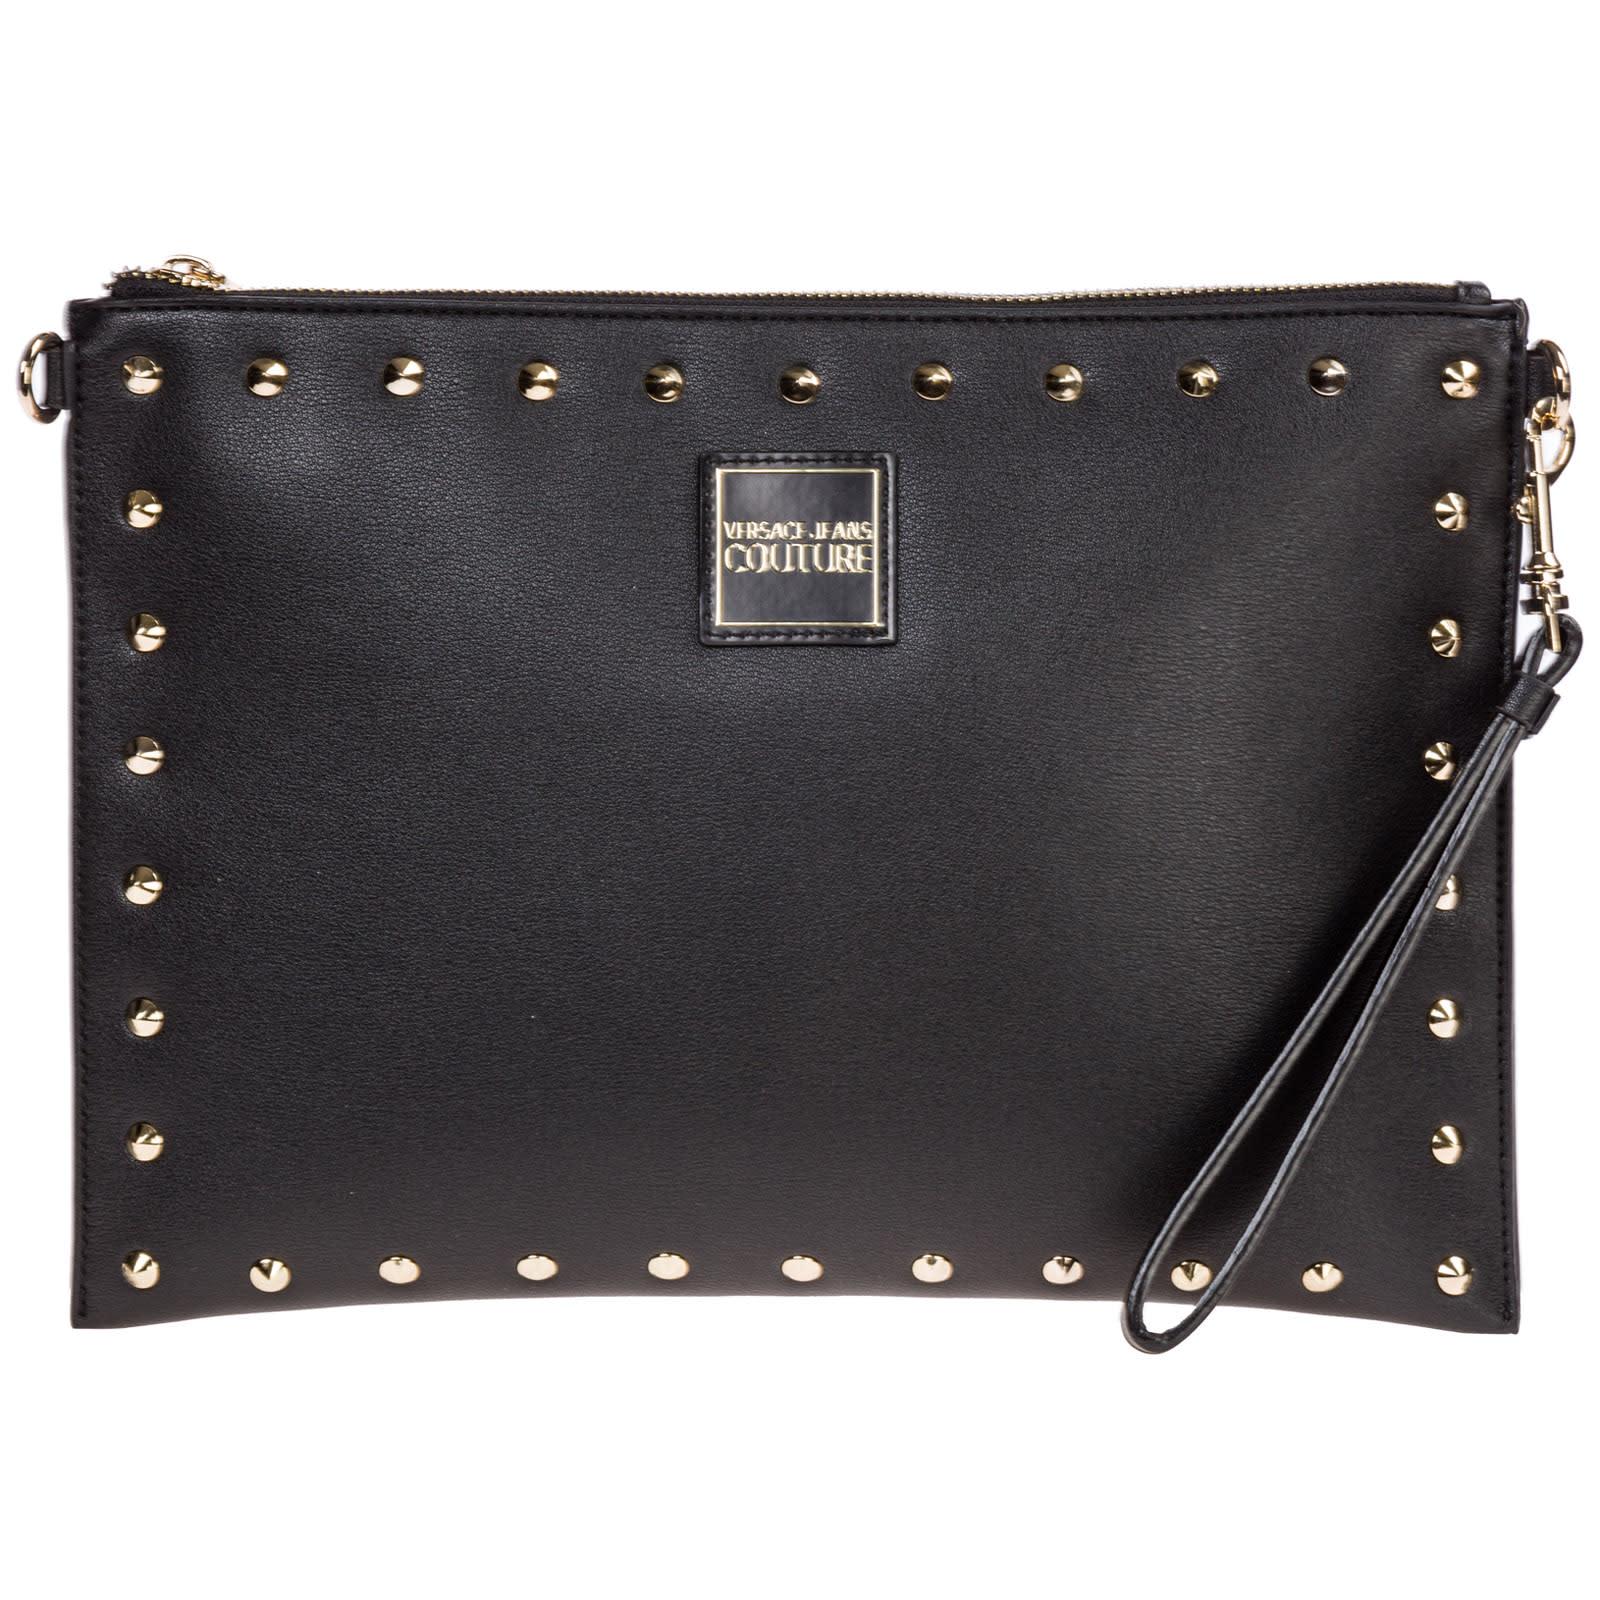 1356dd77 Versace Jeans Couture Clutch With Shoulder Strap Handbag Bag Purse